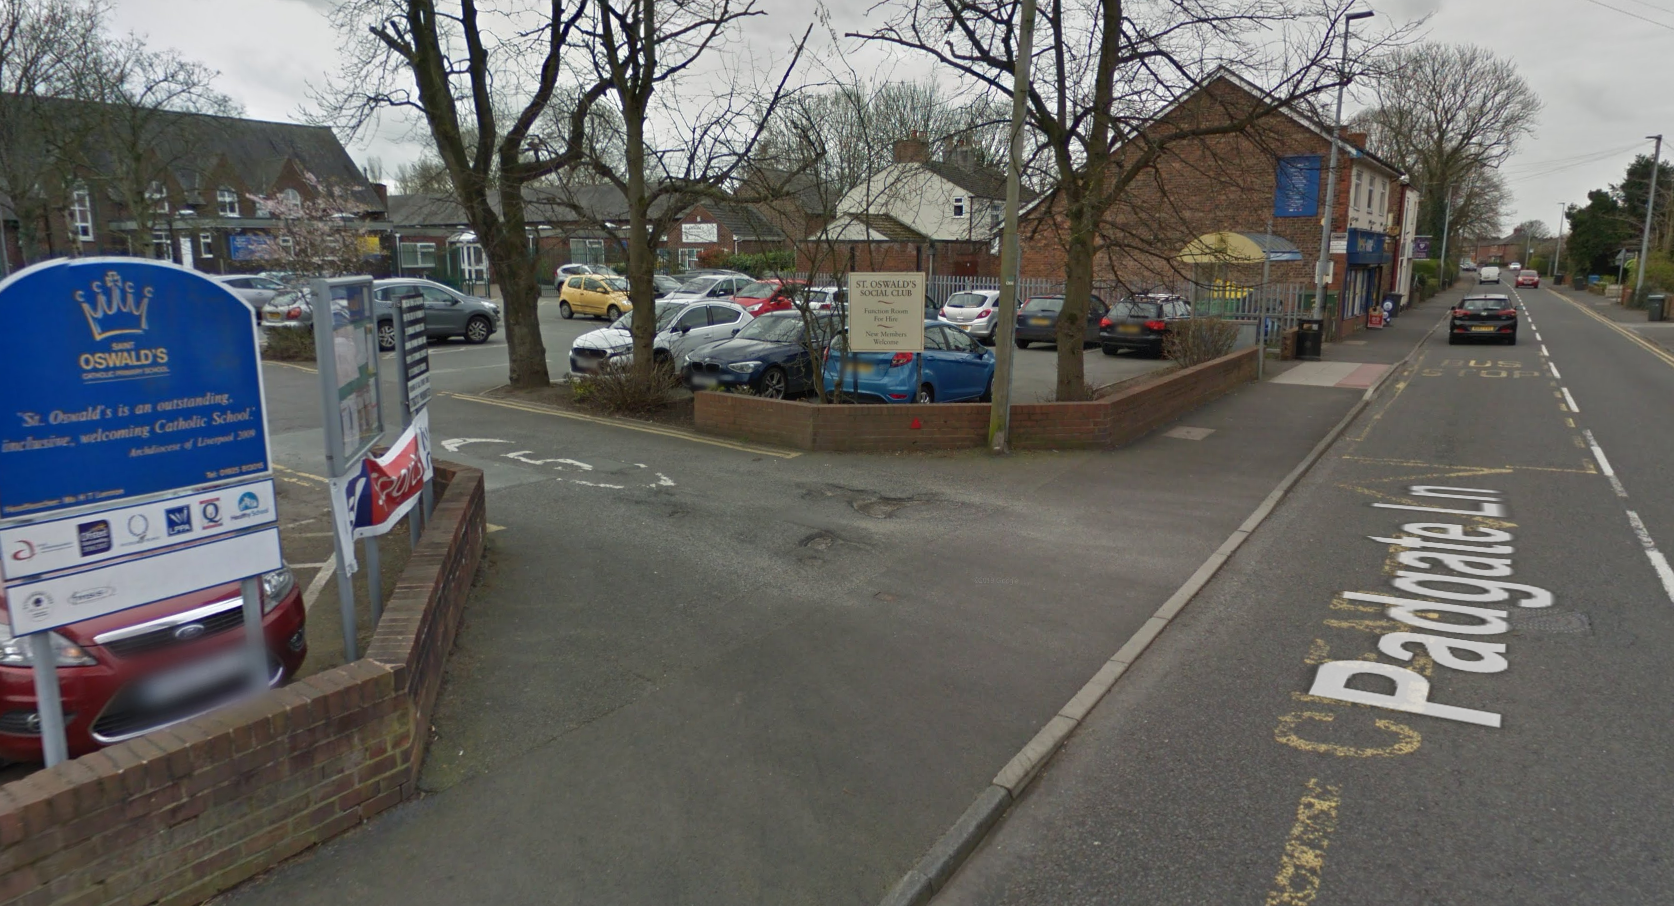 Pedestrian crossing still planned for Padgate Lane